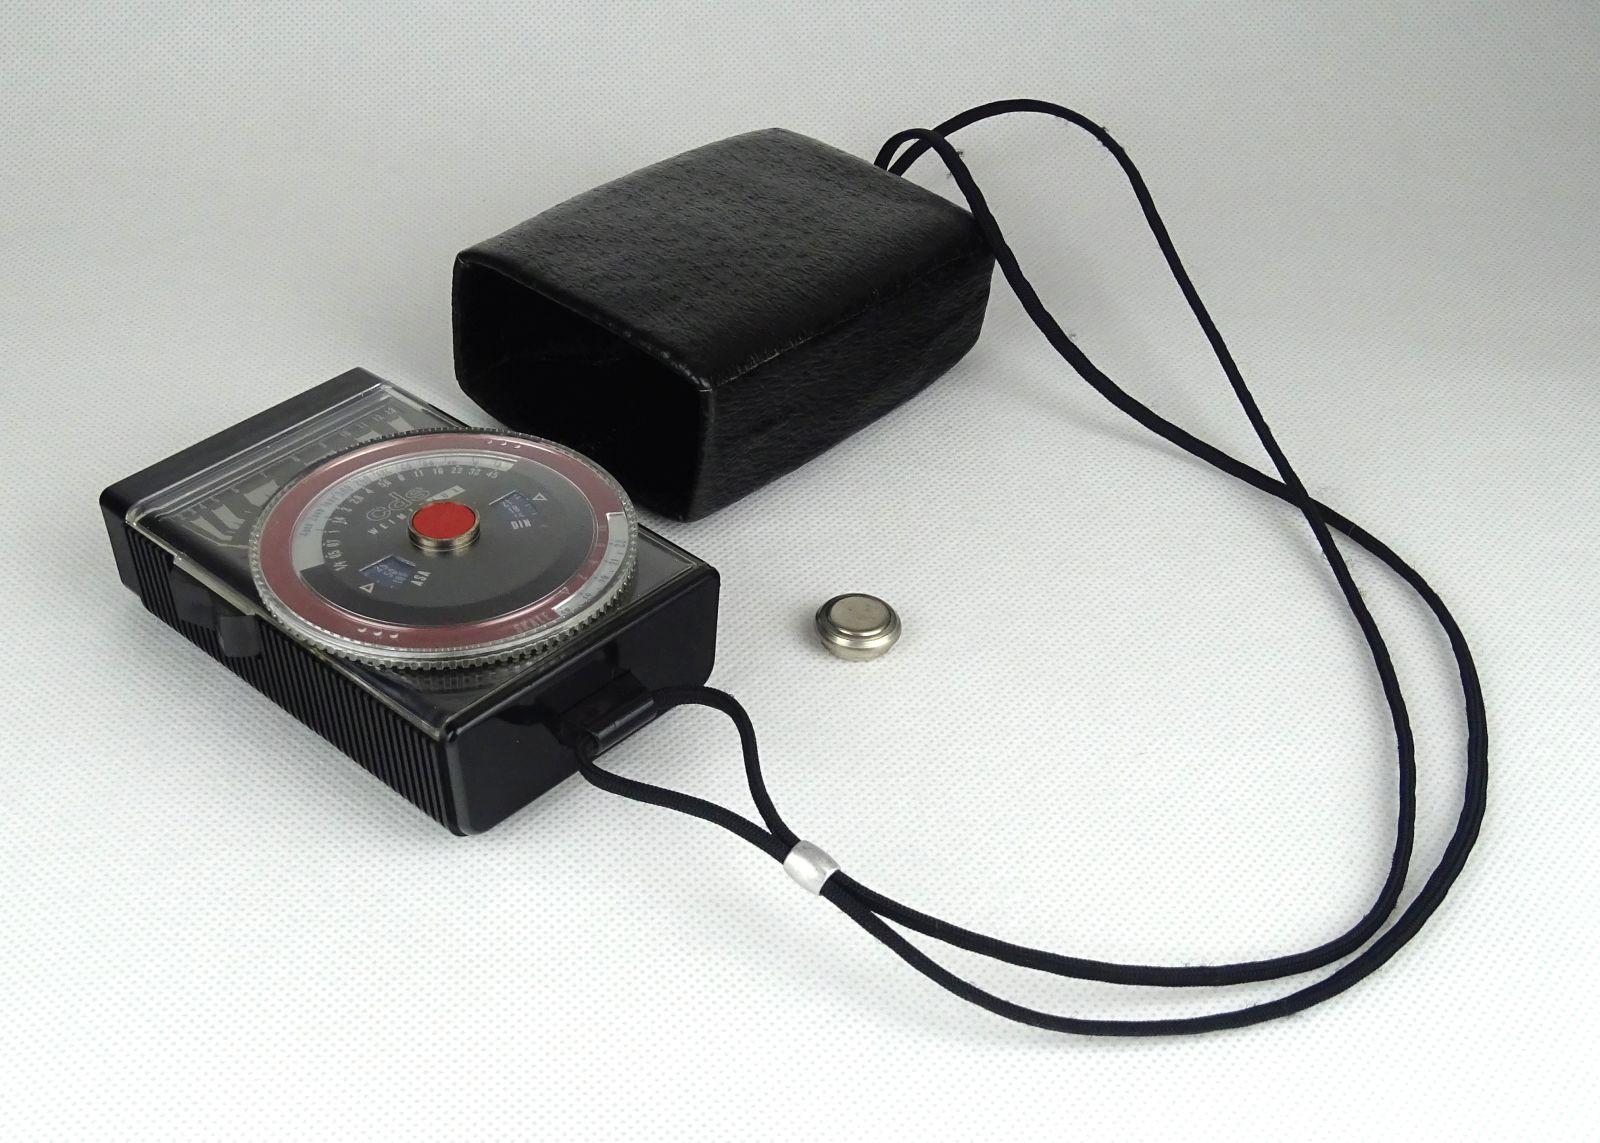 DSC05672.JPG (1600×1143)